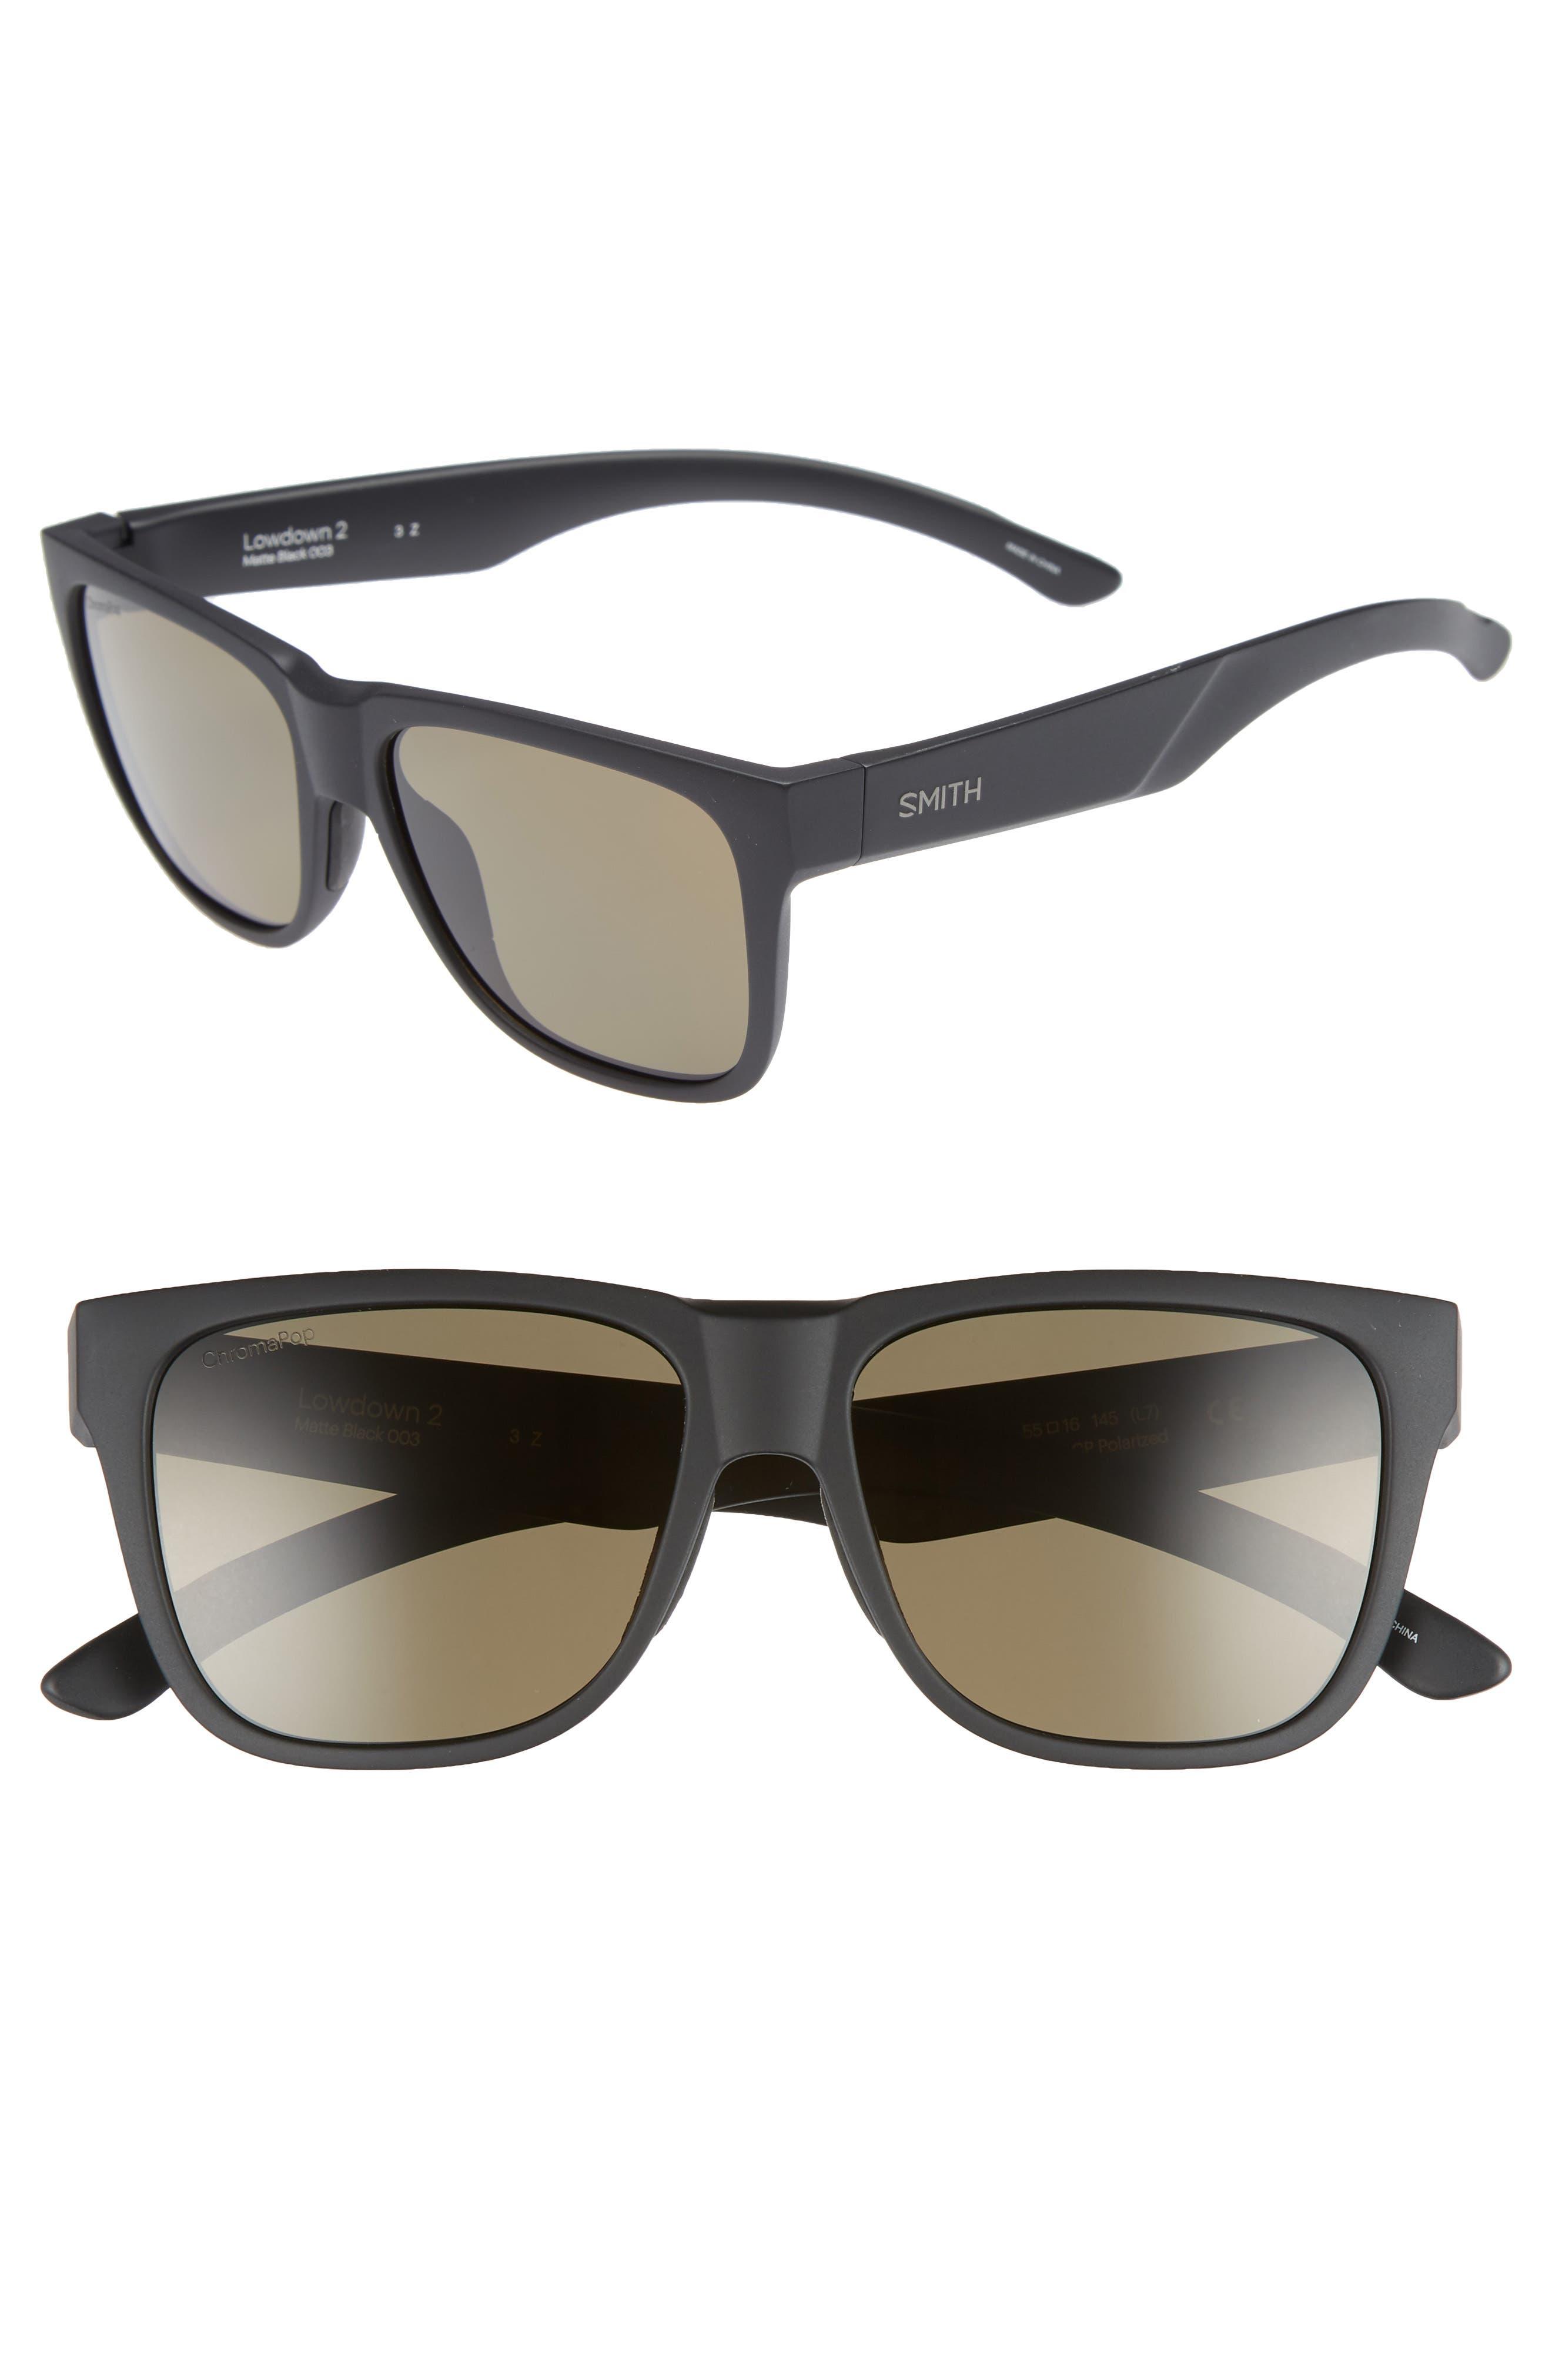 Lowdown 2 55mm ChromaPop<sup>™</sup> Polarized Sunglasses,                             Main thumbnail 1, color,                             MATTE BLACK/ GREY GREEN